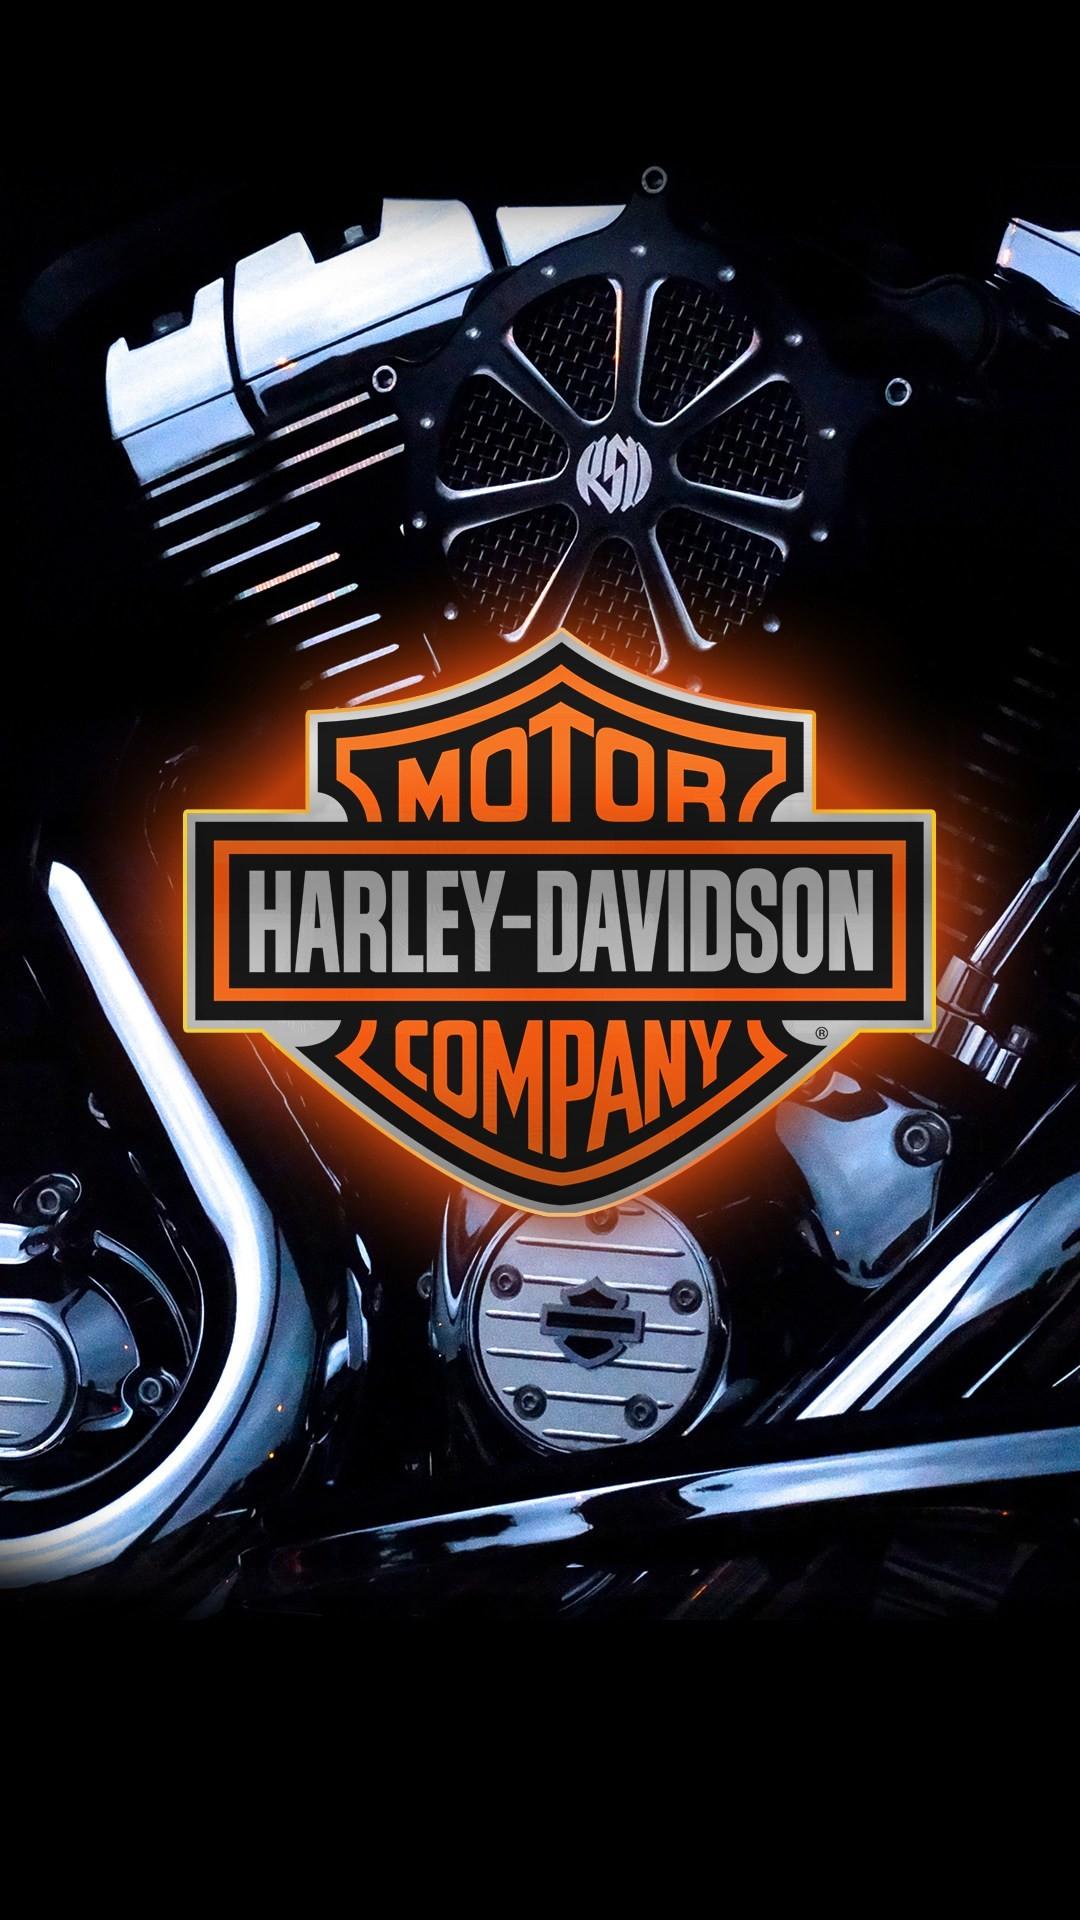 Harley Davidson Free Hd Cell Phone Wallpaper